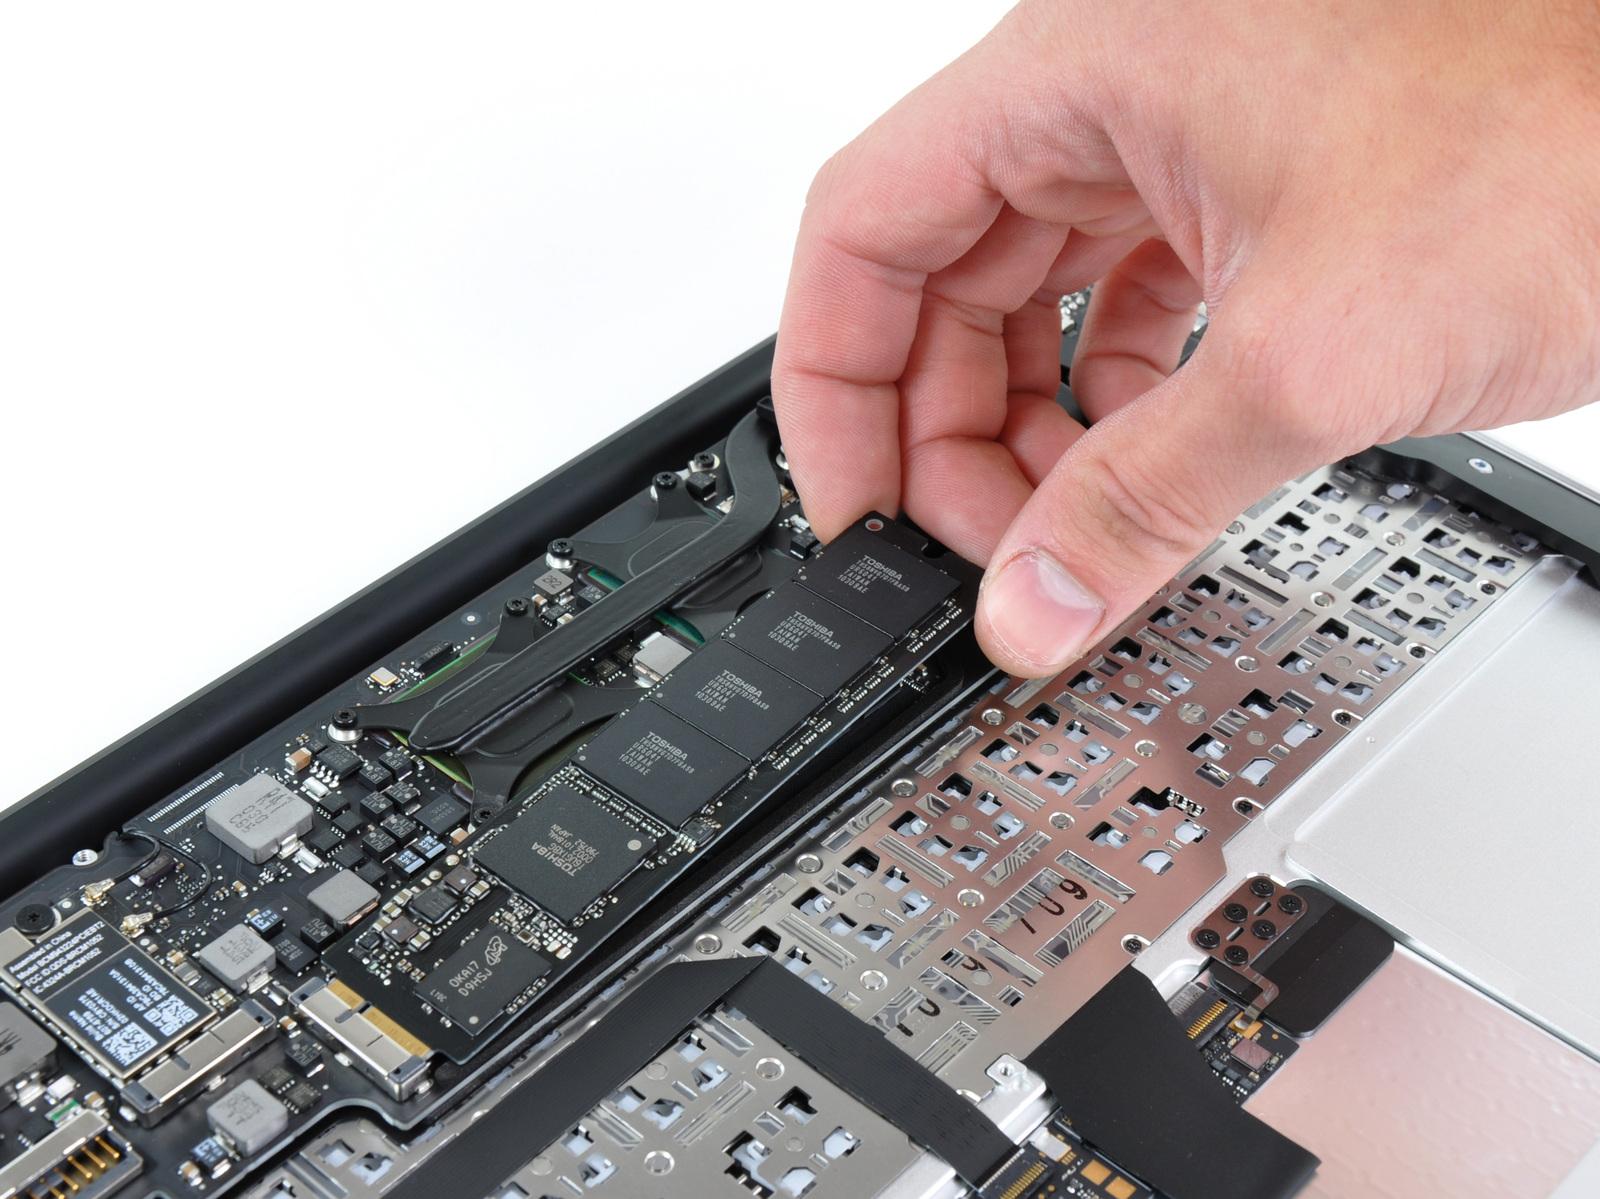 nâng cấp ram laptop macbook lấy liền